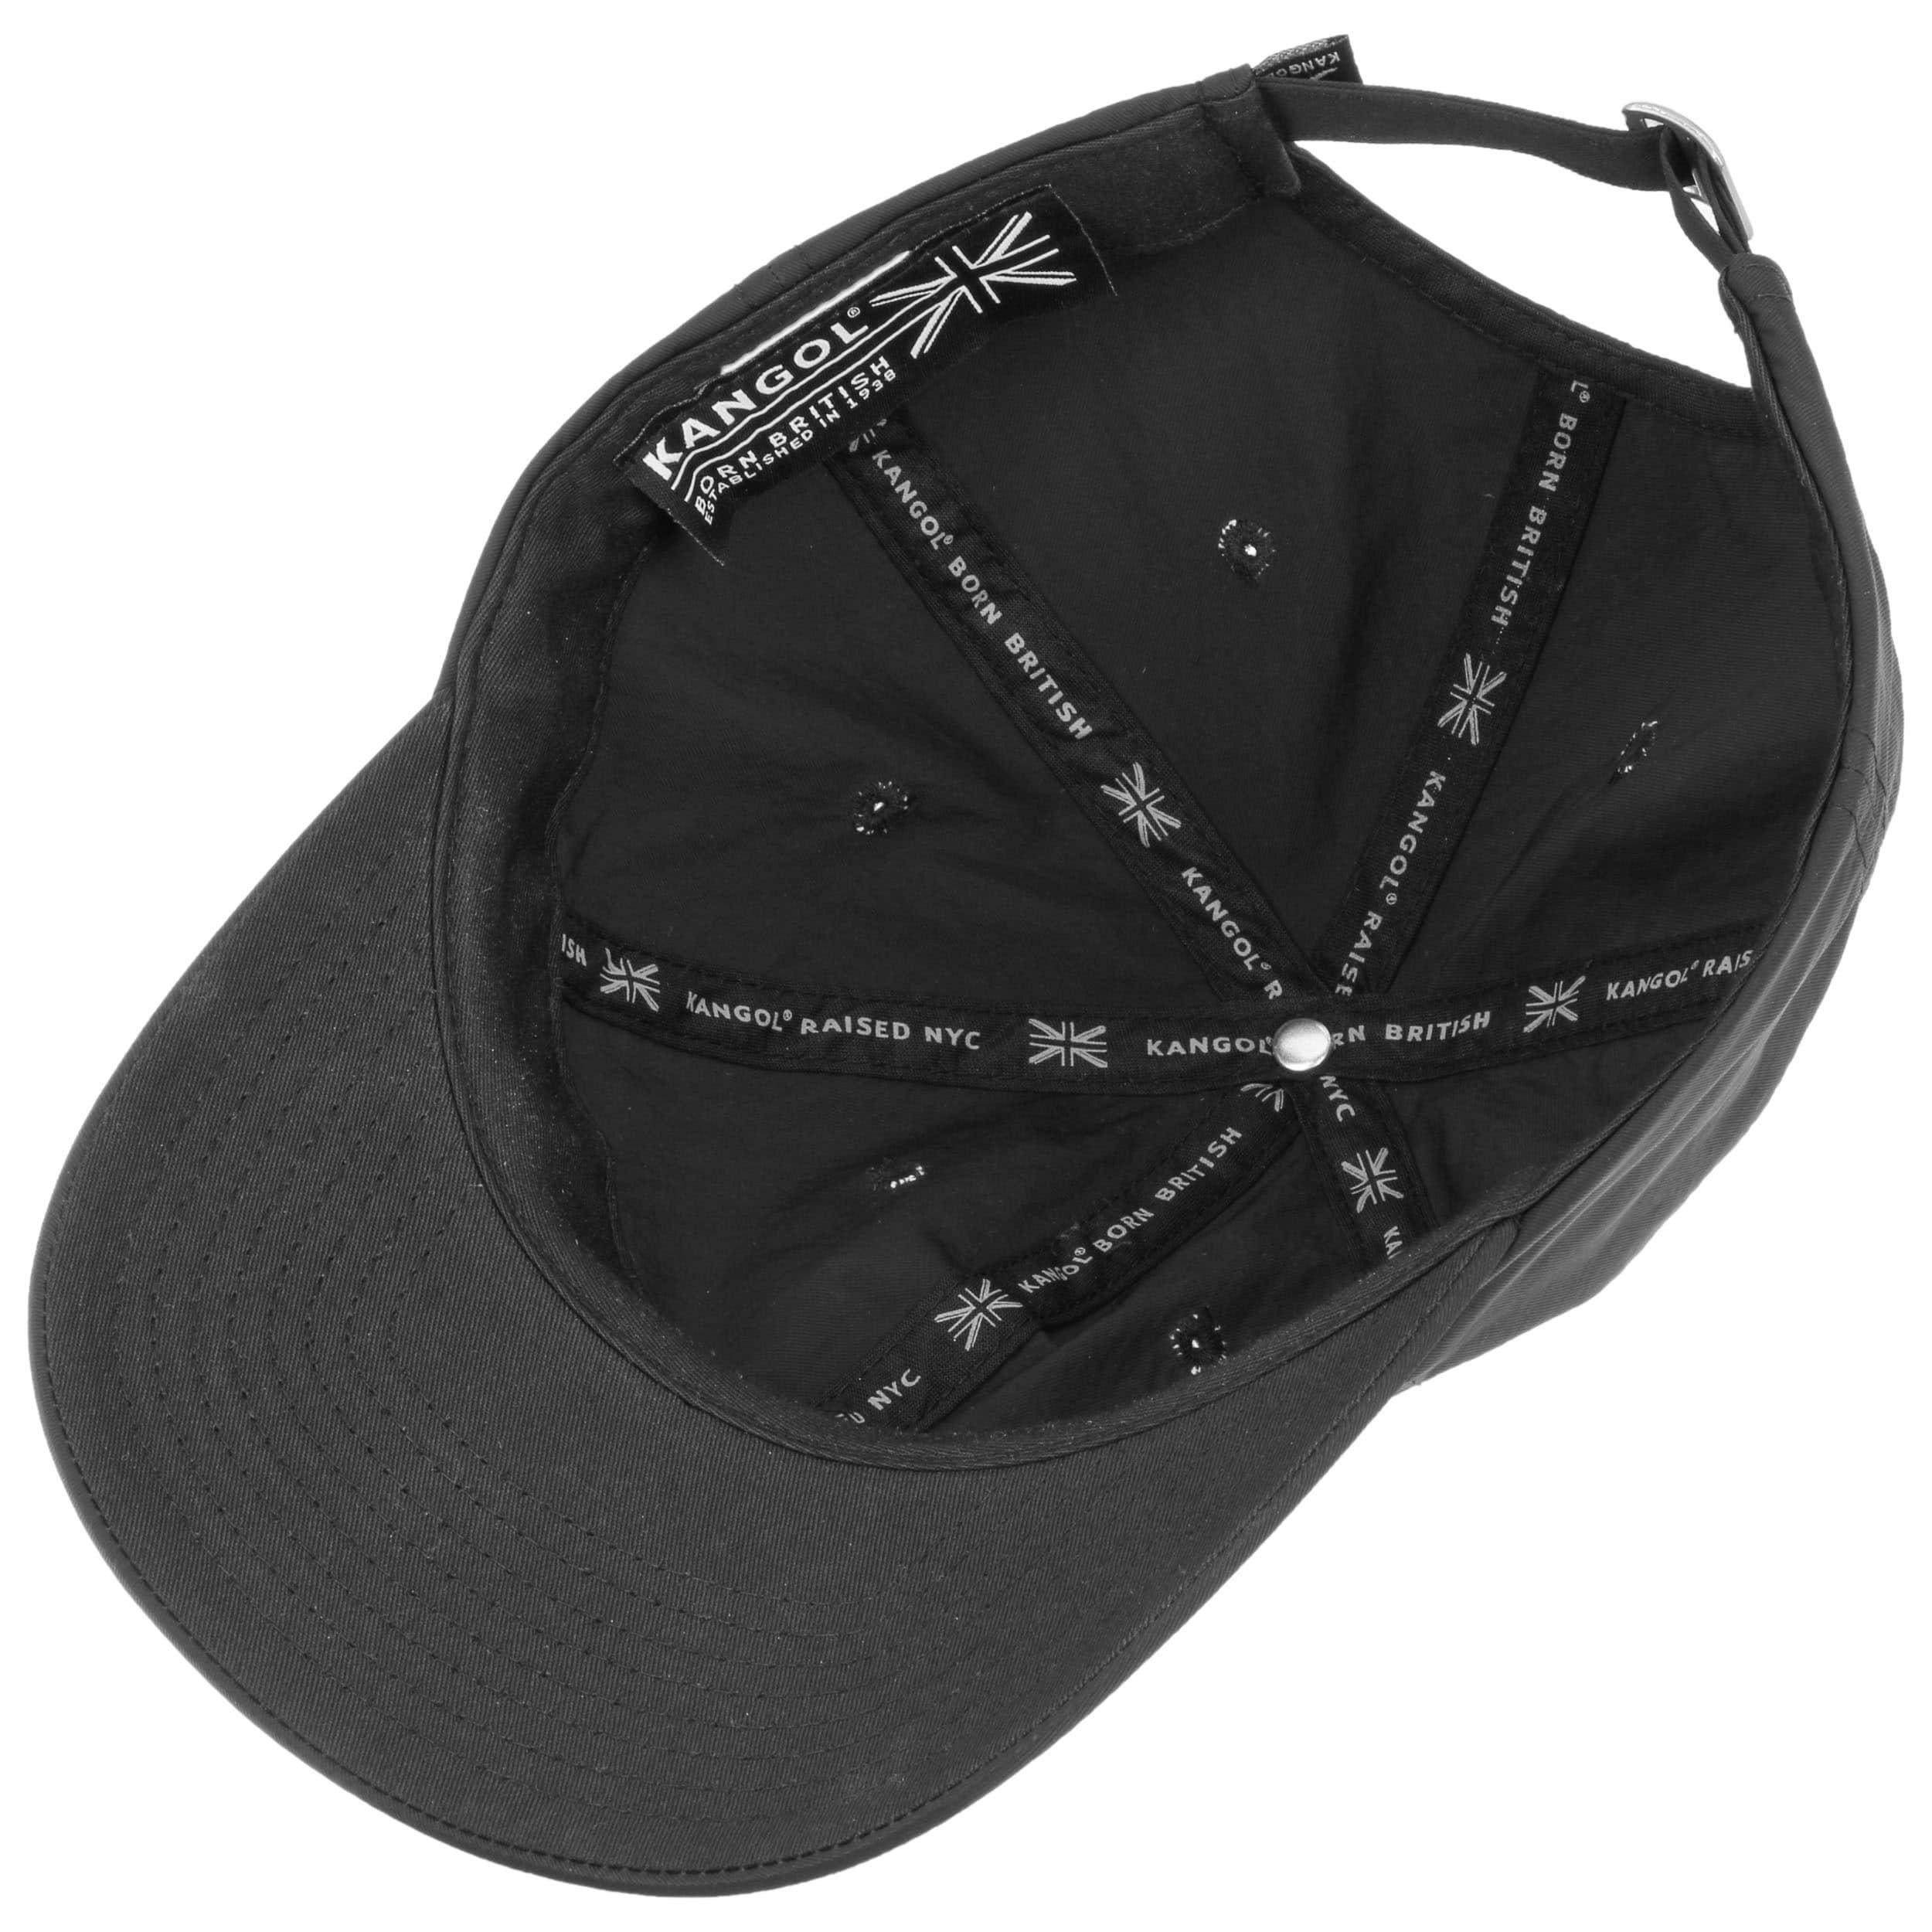 ... Vintage Baseball Cap by Kangol - black 2 ... b5bf4248849d